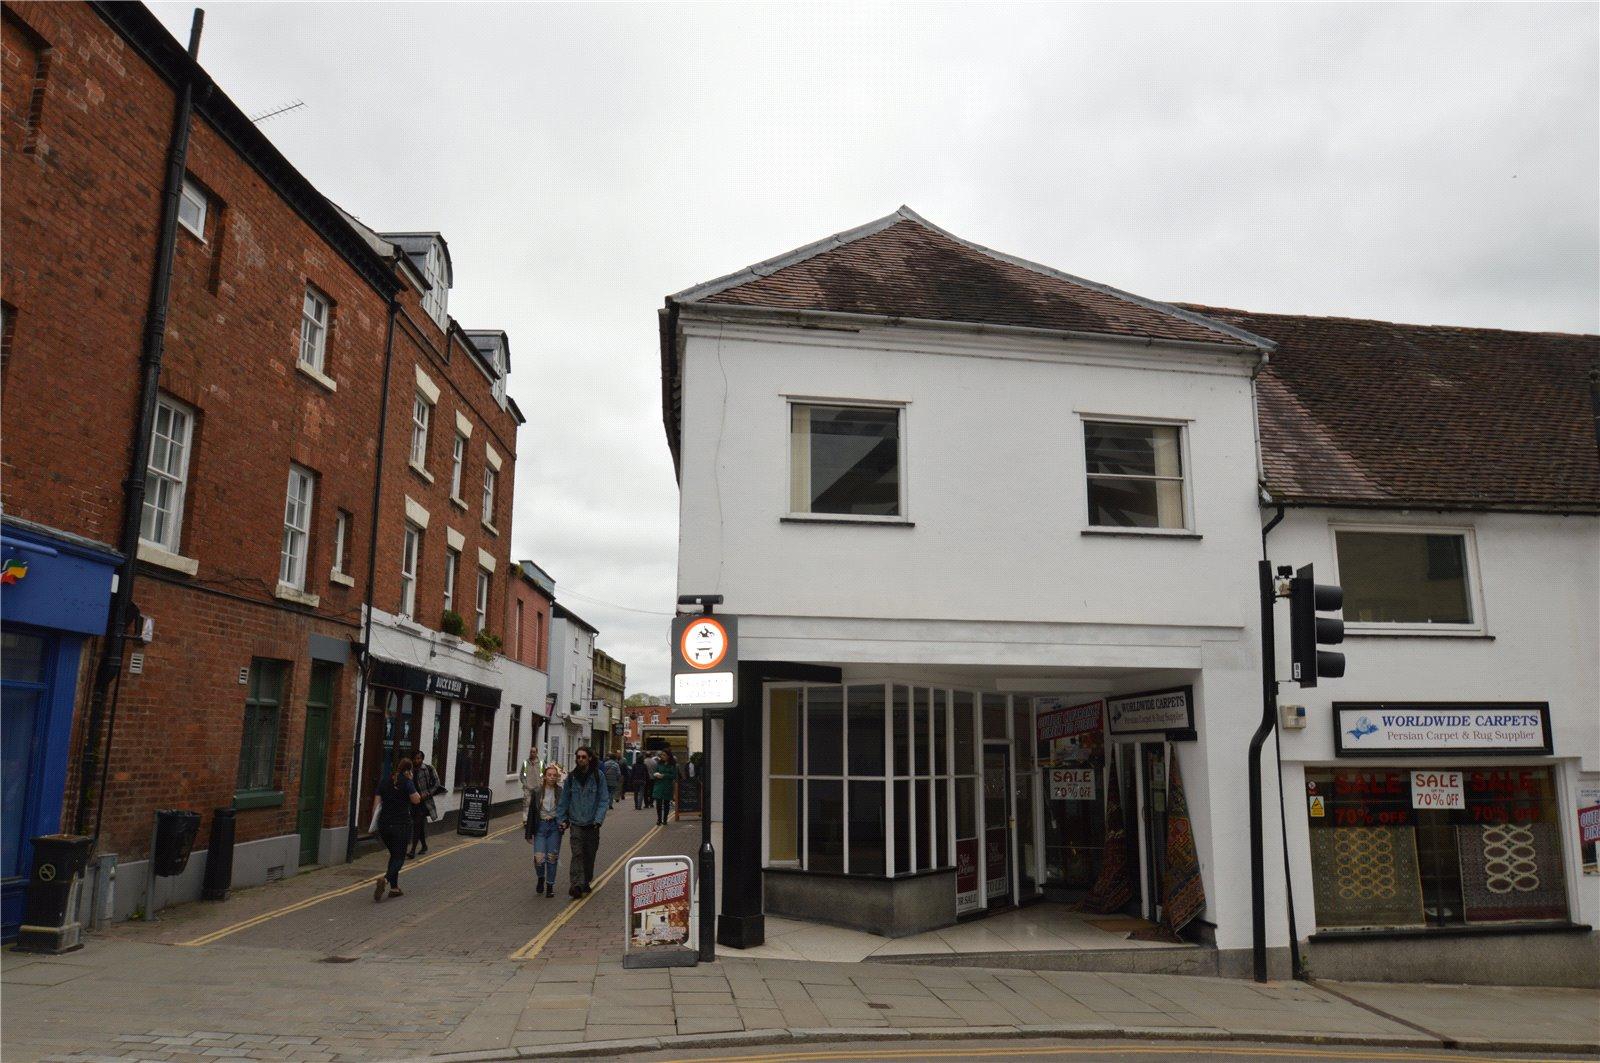 17 Tower Street, Ludlow, Shropshire, SY8